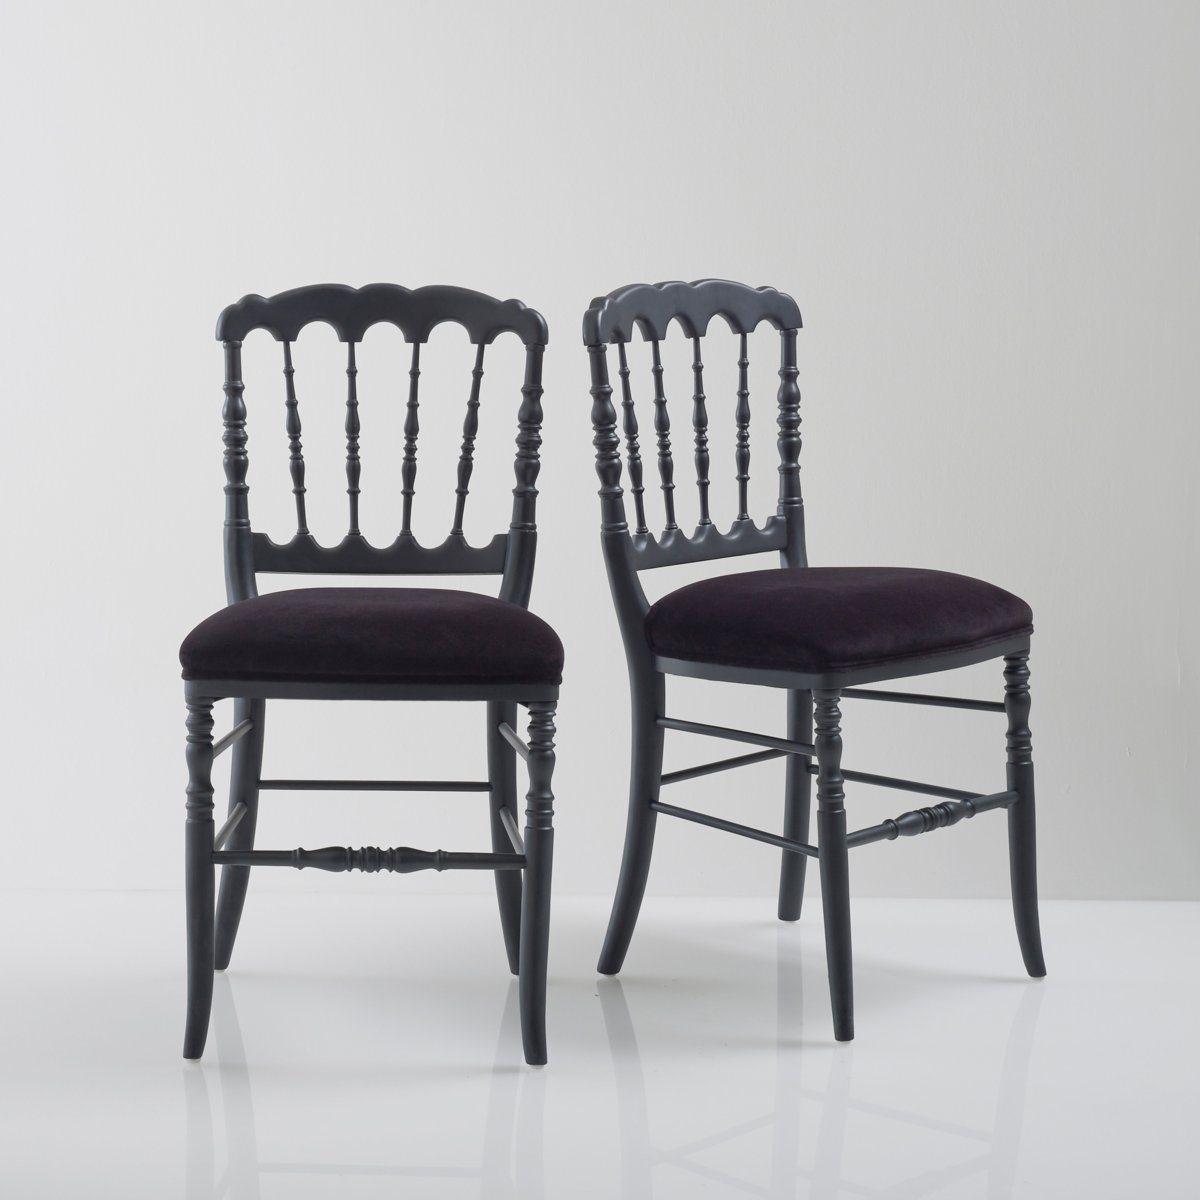 2 стула в стиле Наполеона III, Lipstick